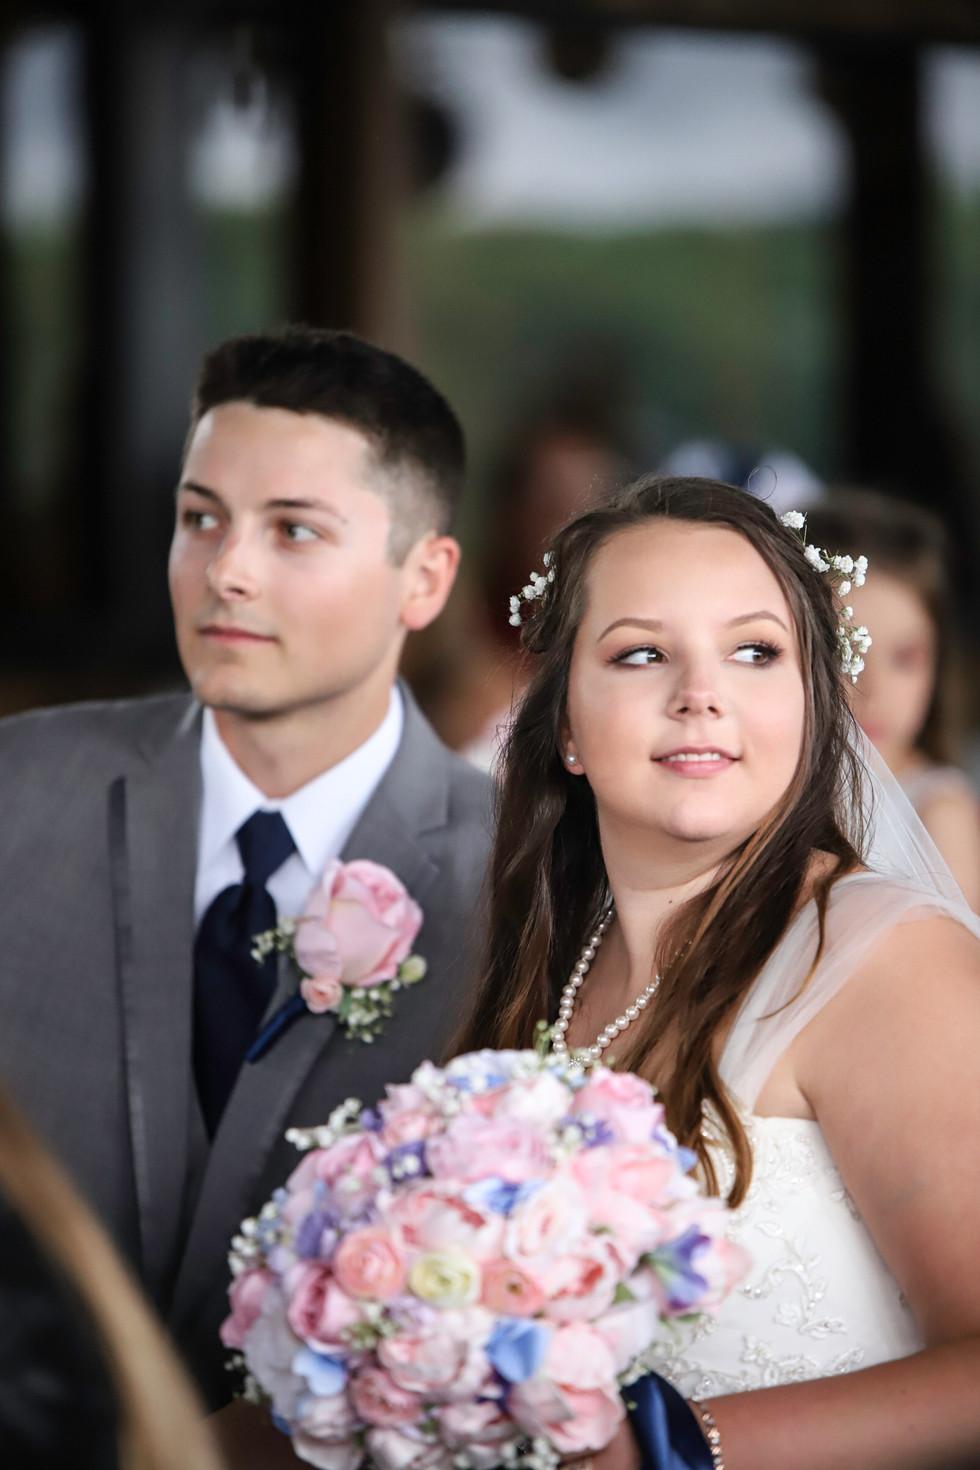 Hanners-Underwood Wedding-181.jpg